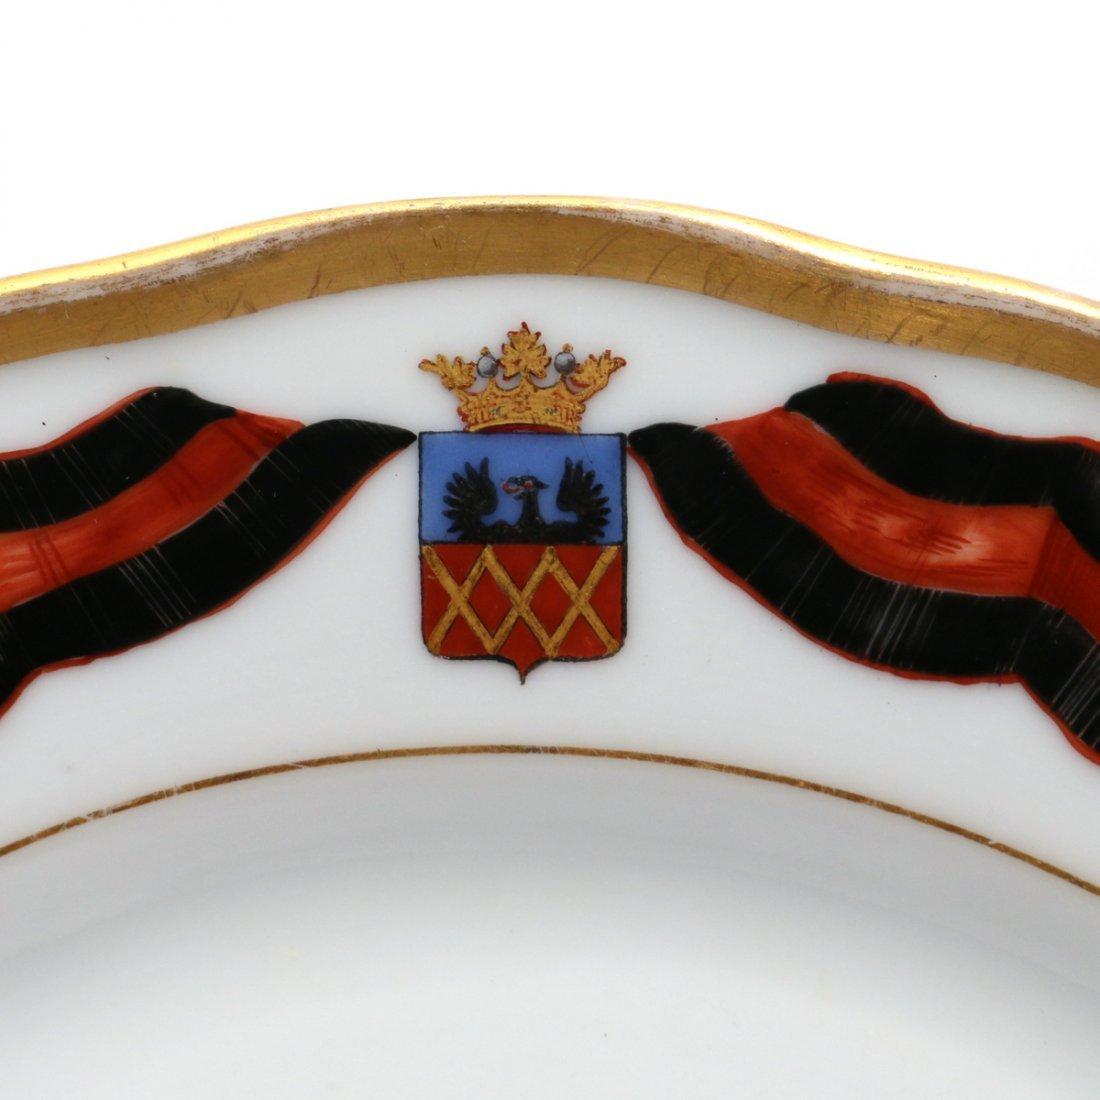 (2pc) BROTHERS KORNILOV ARMORIAL PLATES - 8